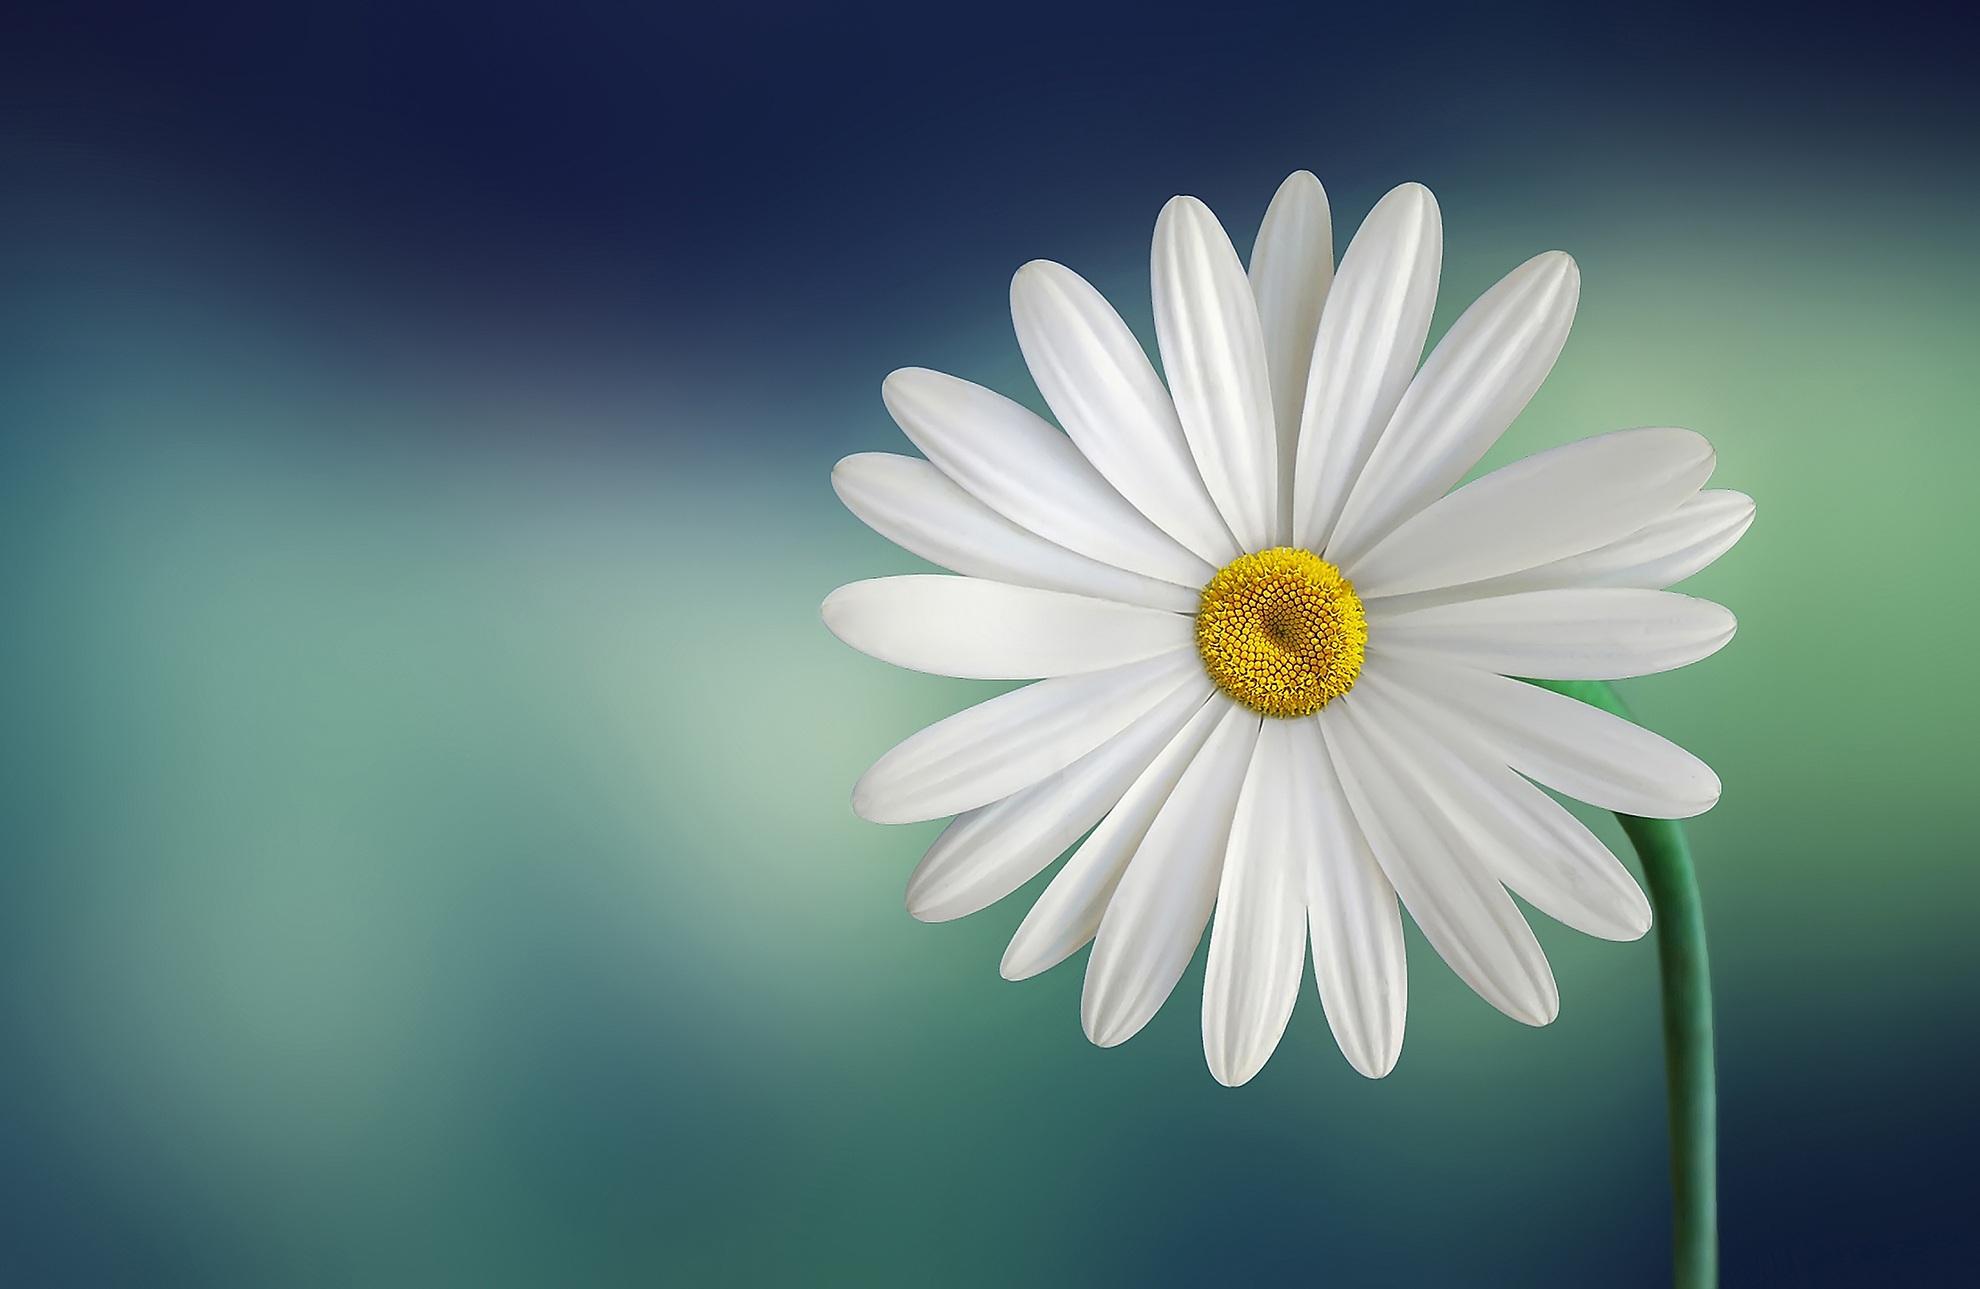 hinh anh hoa cuc dep 78